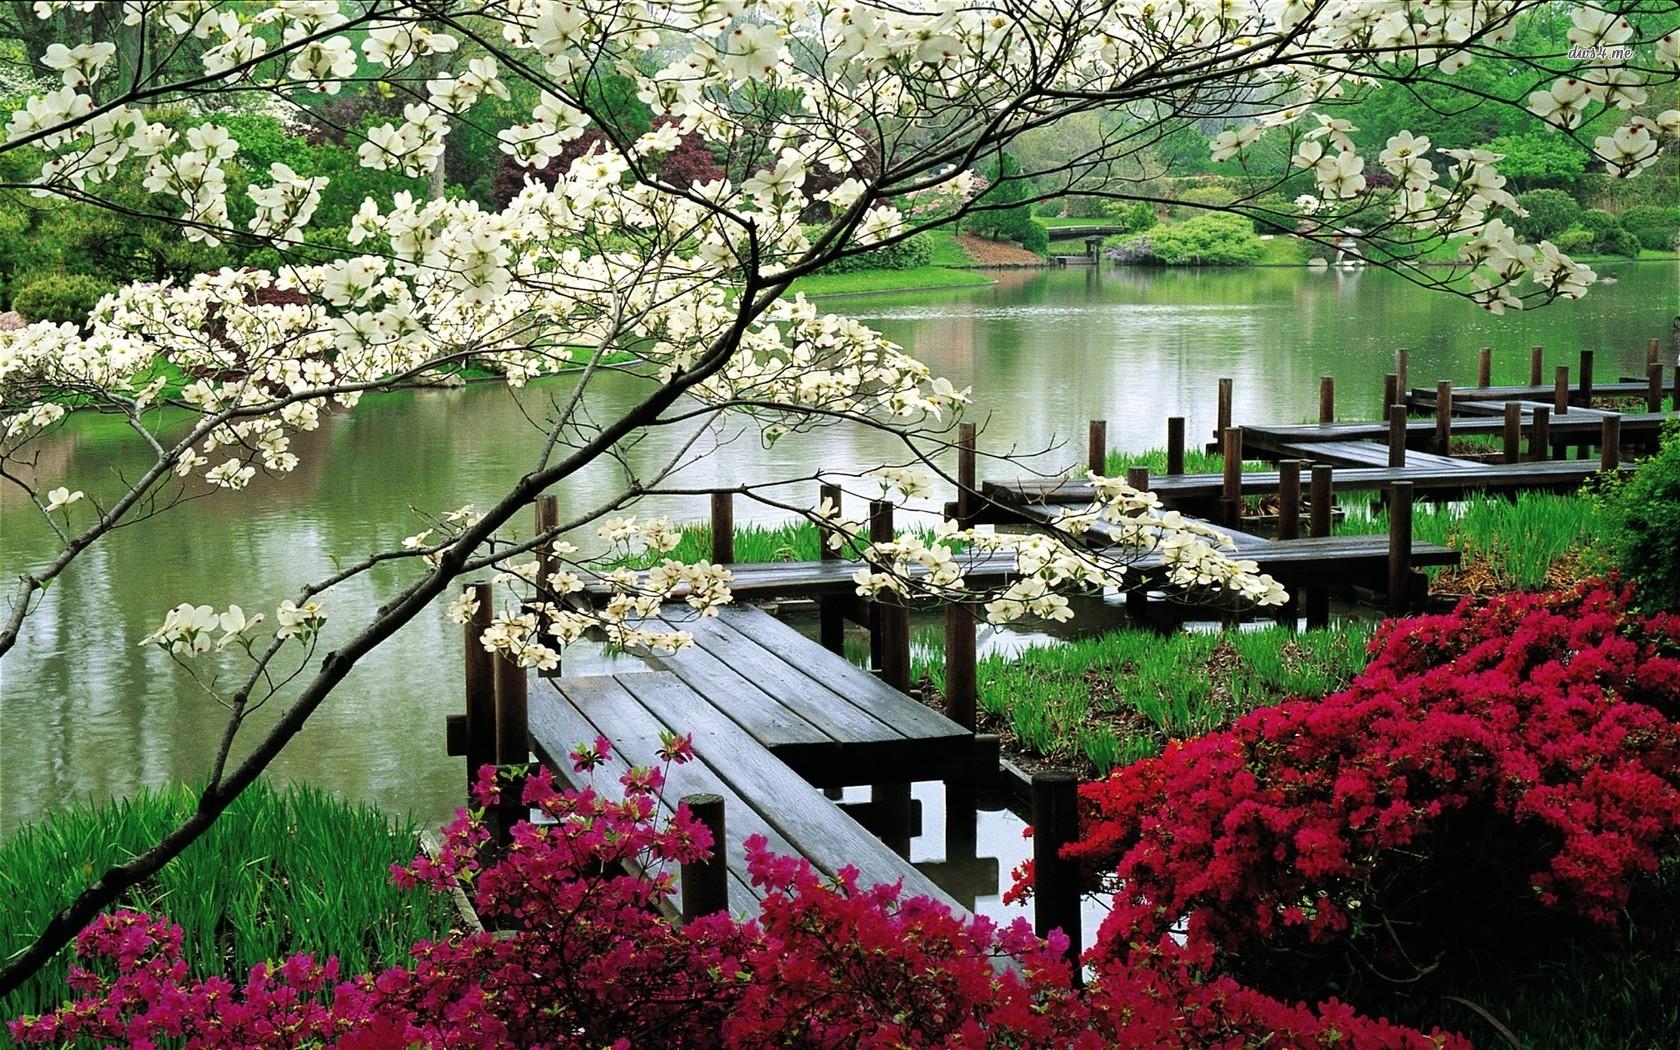 Flower Garden Wallpaper Background japanese desktop wallpaper - wallpapersafari